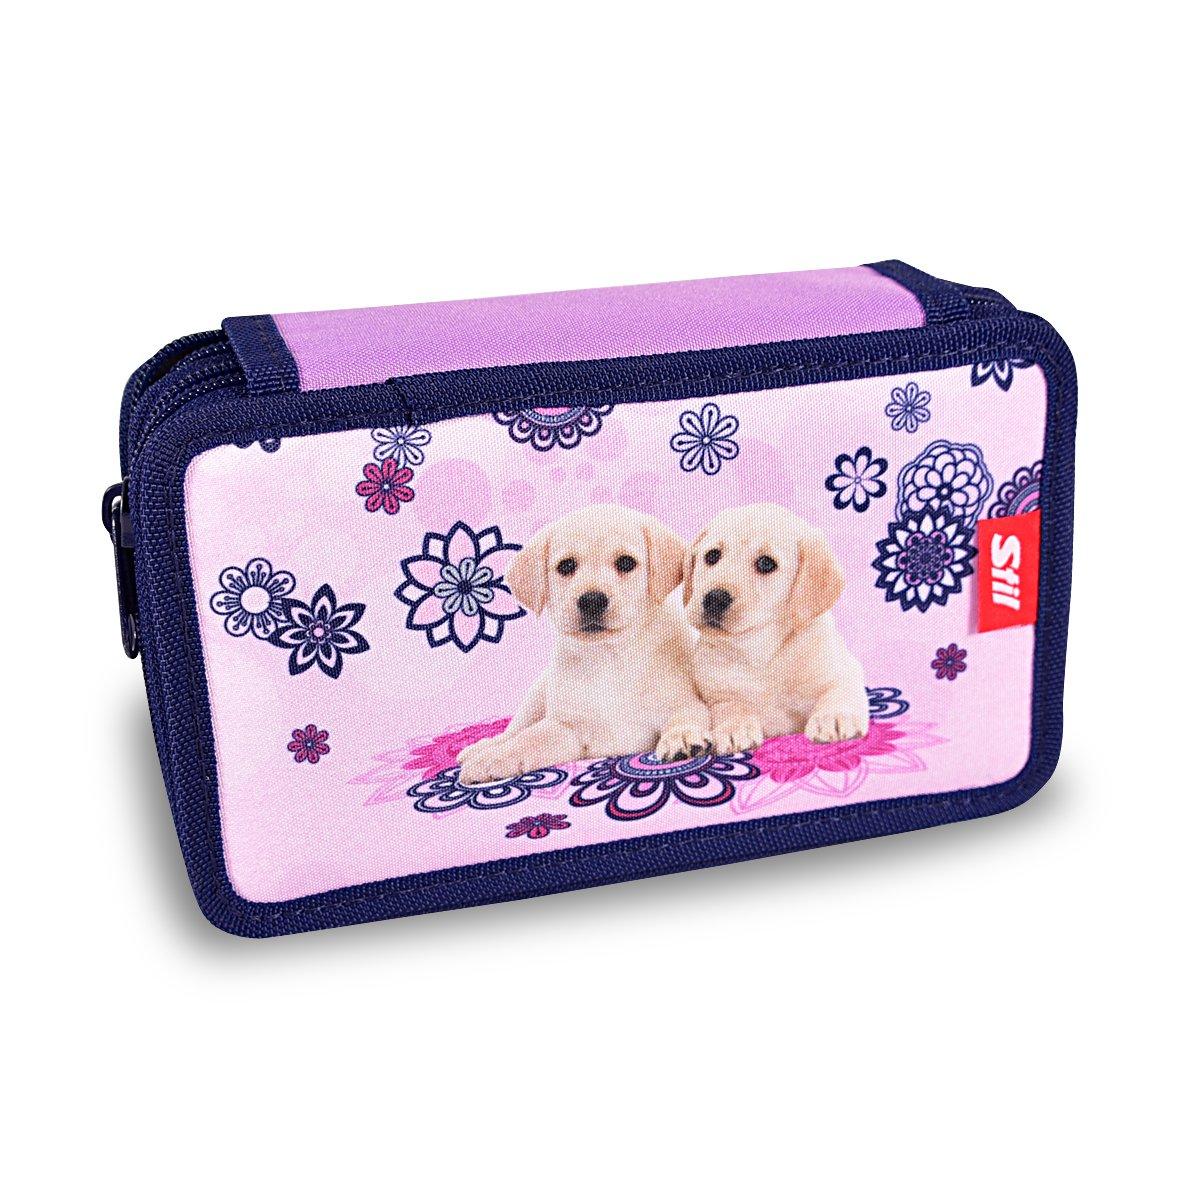 1523034/Stylish Double Tier Zip Around Pencil Bag Best Friends